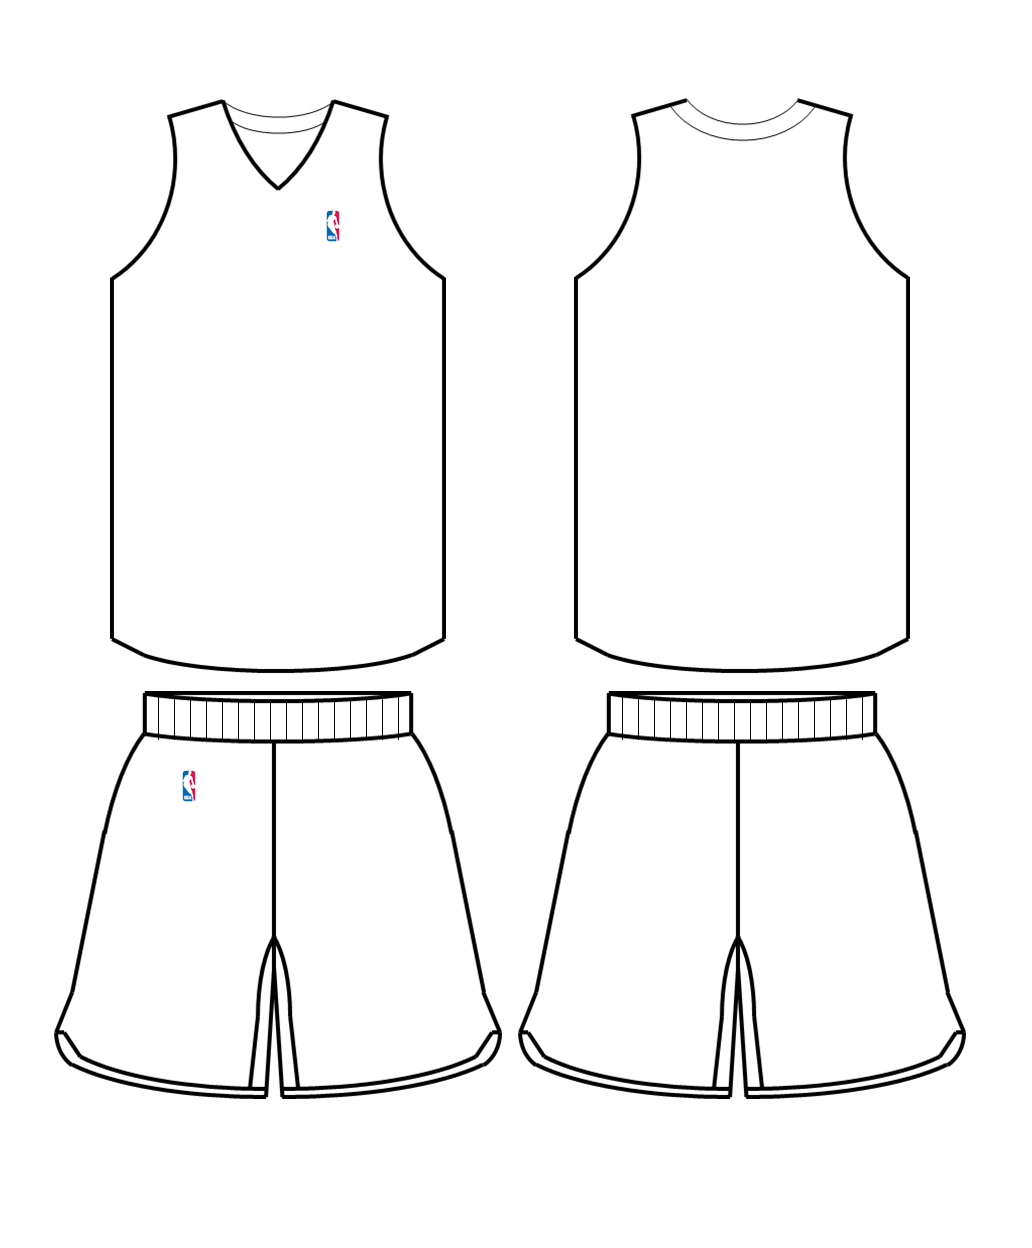 Free Blank Basketball Jersey, Download Free Clip Art, Free Regarding Blank Basketball Uniform Template